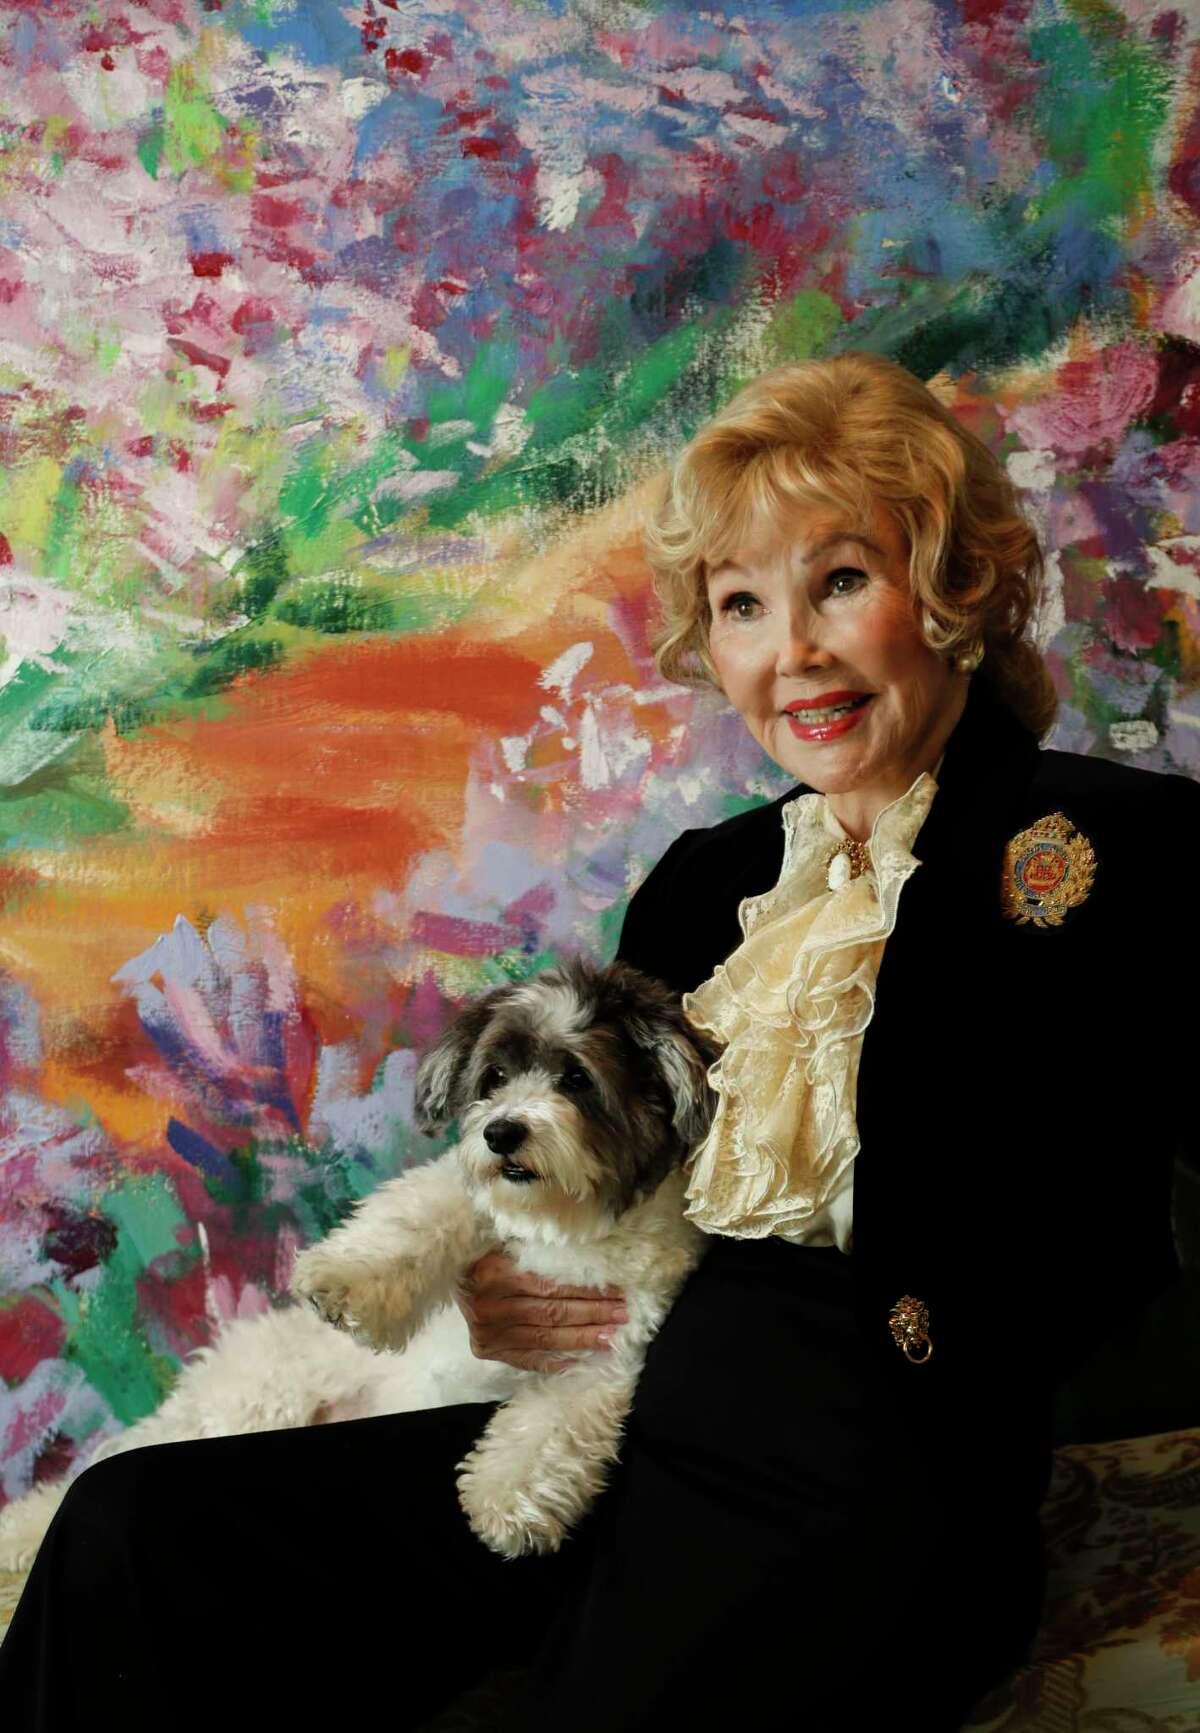 Joanne Herring photographed in her home, Monday, March 13, 2017, in Houston. ( Karen Warren / Houston Chronicle )